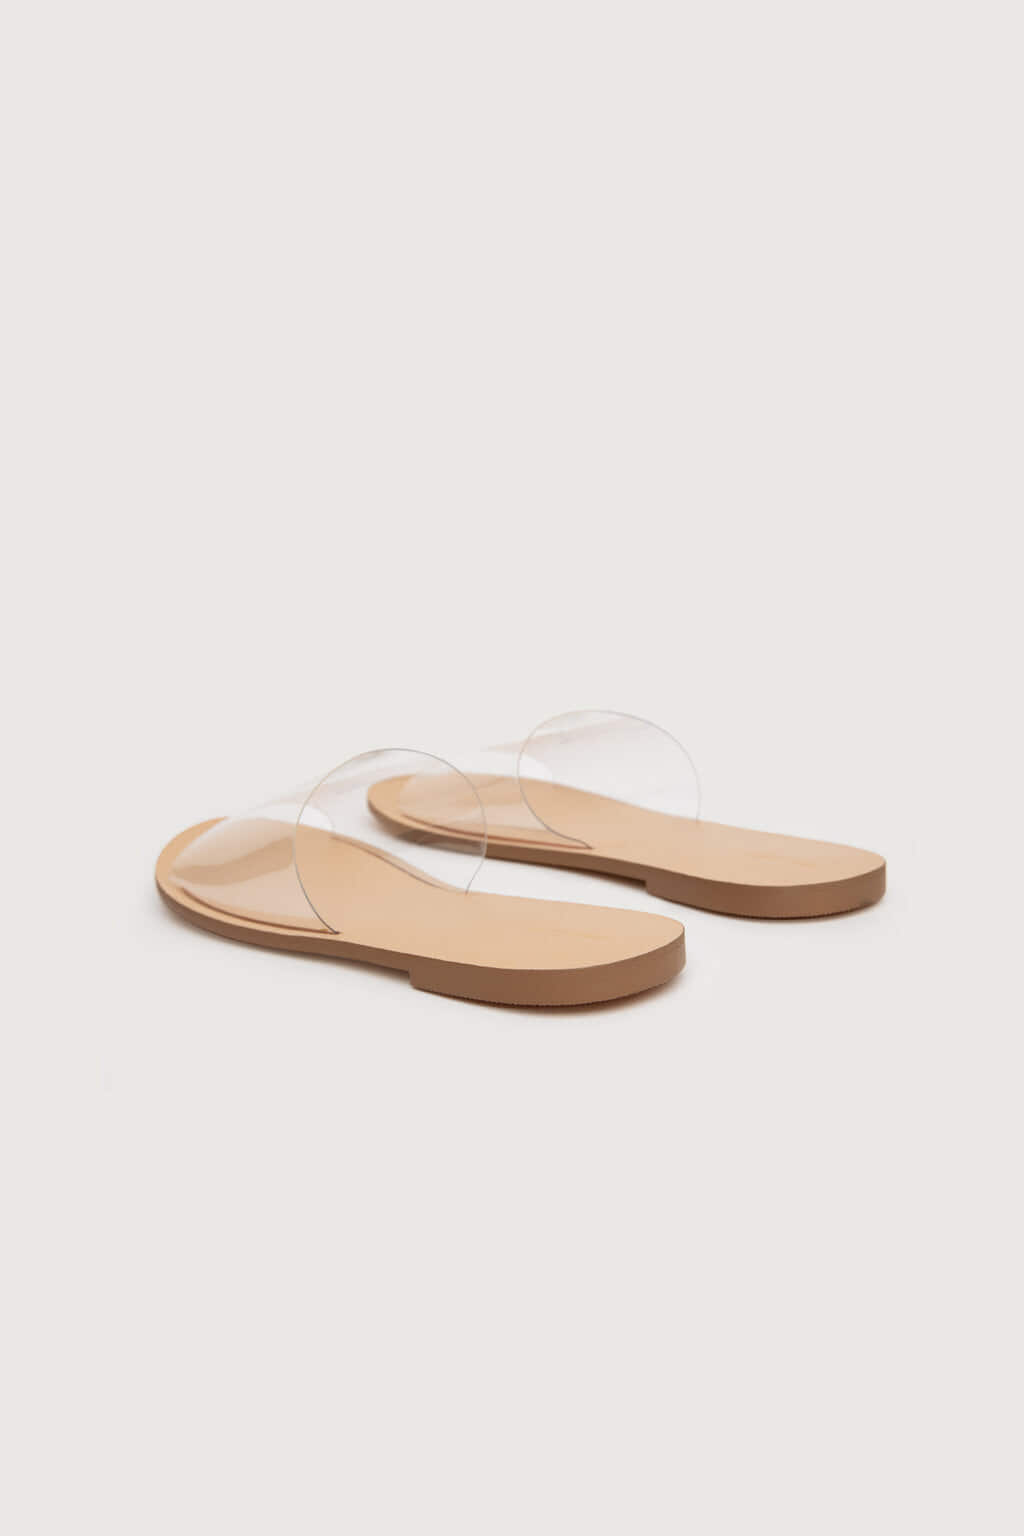 Sandal 3354 Clear 11